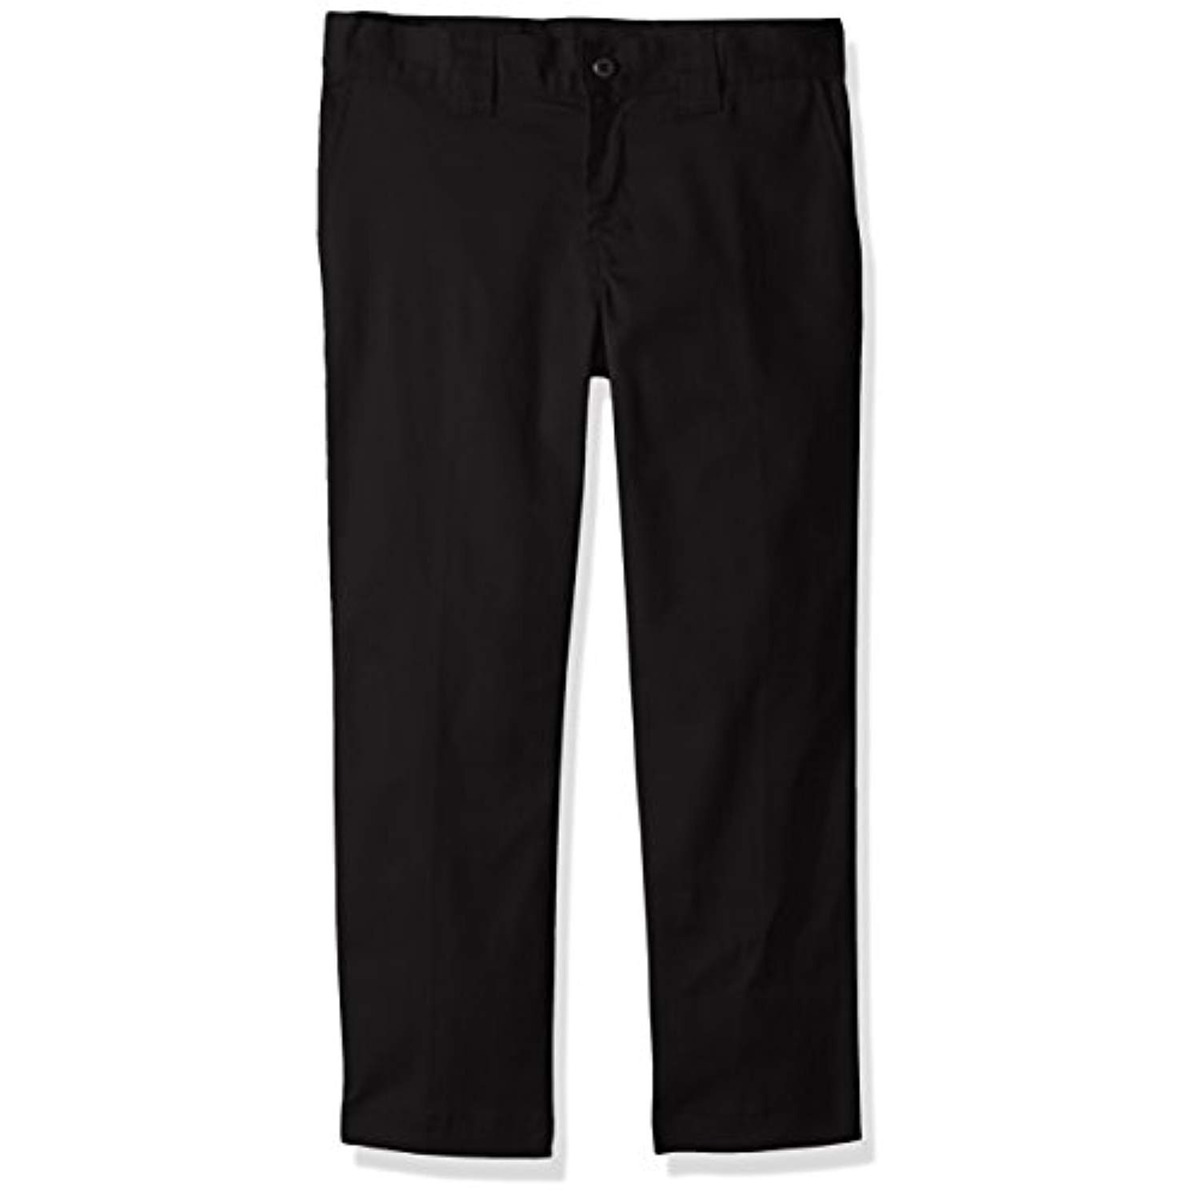 Classroom School Uniforms Boys Big Husky Narrow Leg Pant